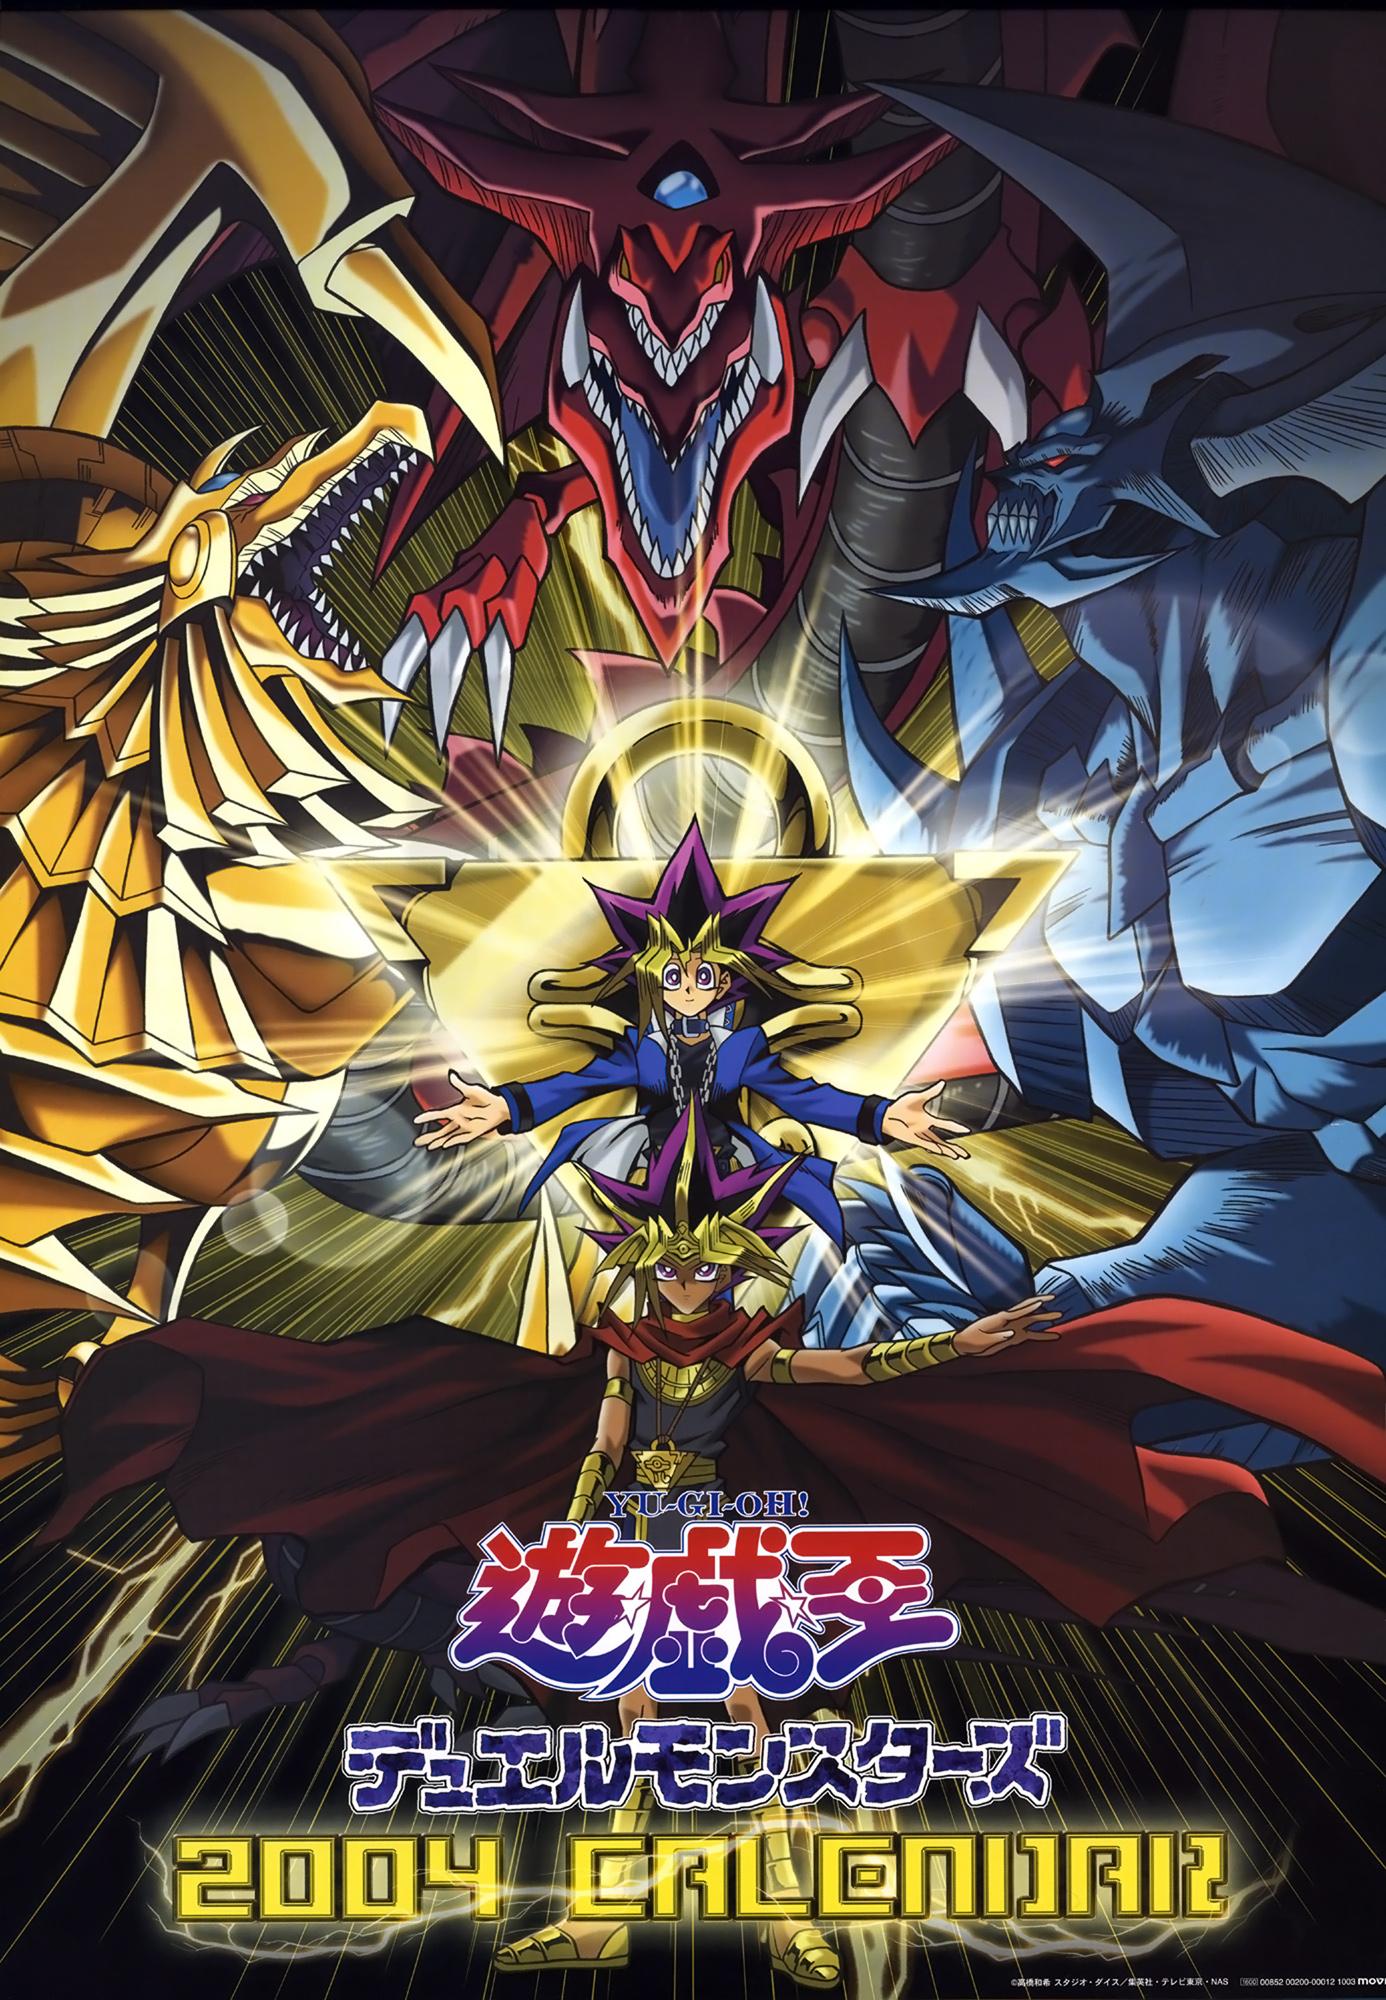 Yu Gi Oh Dioses Egipcios Wallpaper slifer the sky dragon, mobile wallpaper - zerochan anime image board